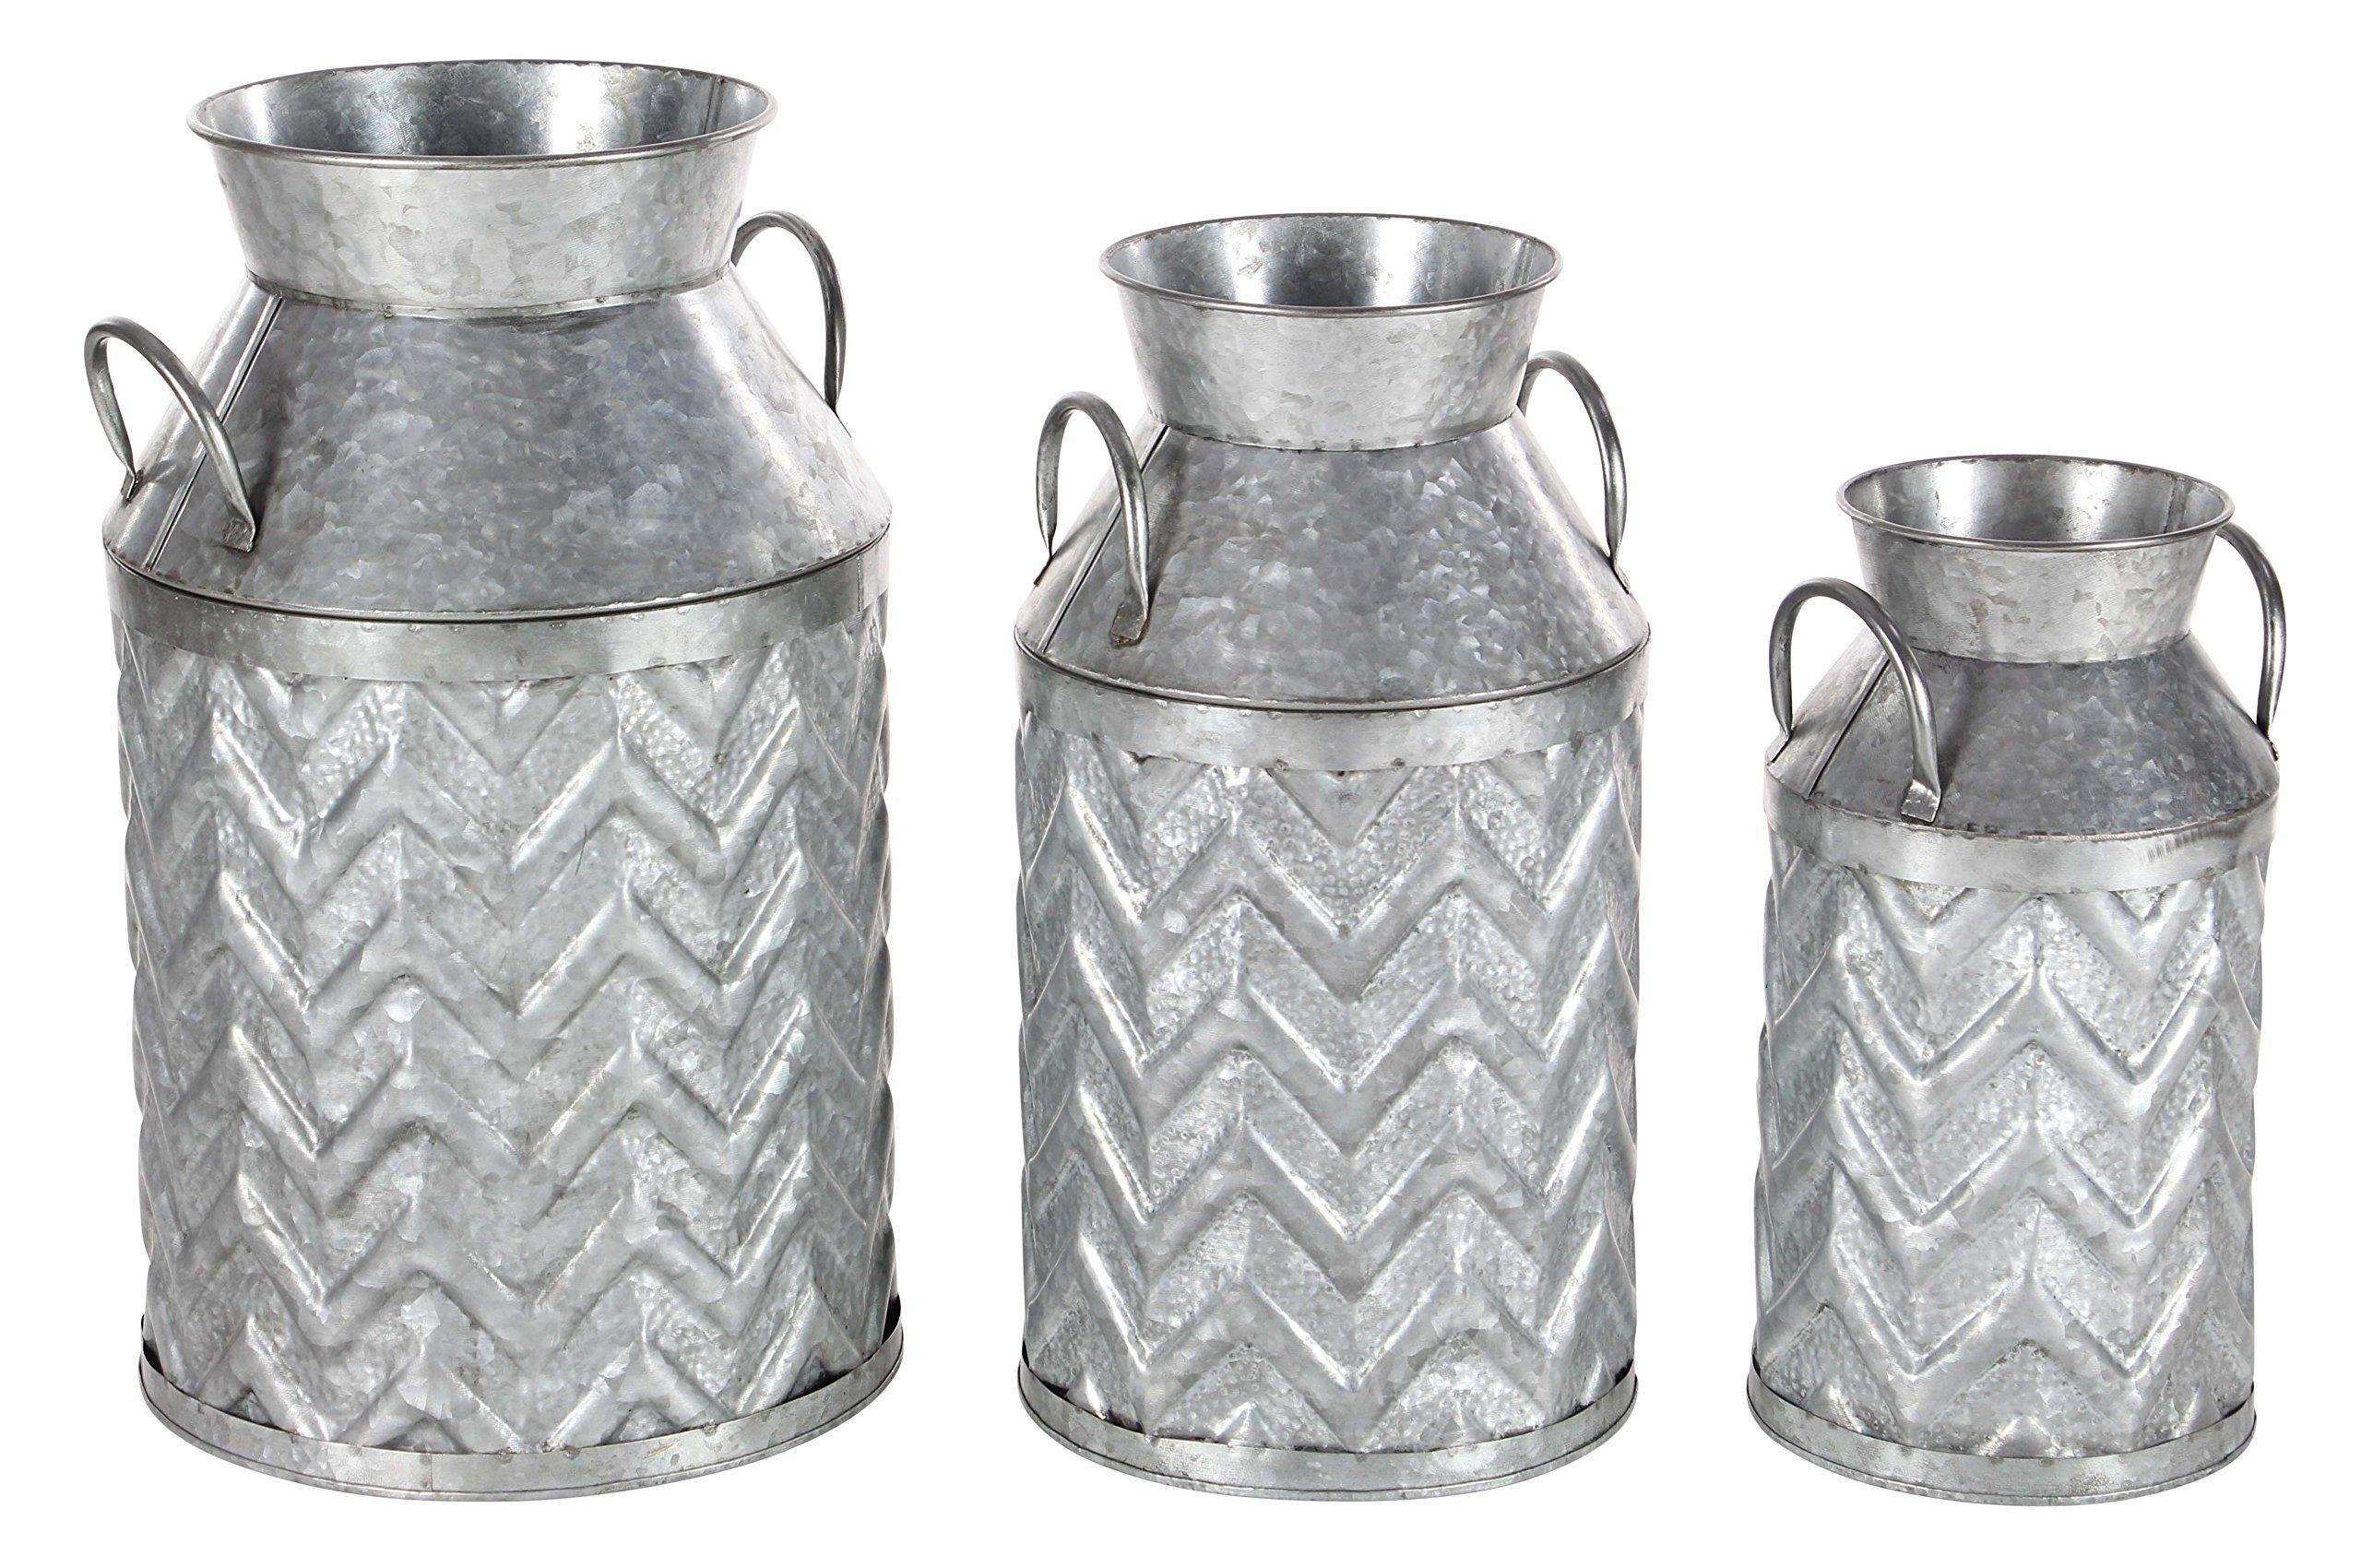 Deco 79 98146 Decorative Iron Milk Jugs (Set of 3), 13'' x 17'' x 18'', Gray